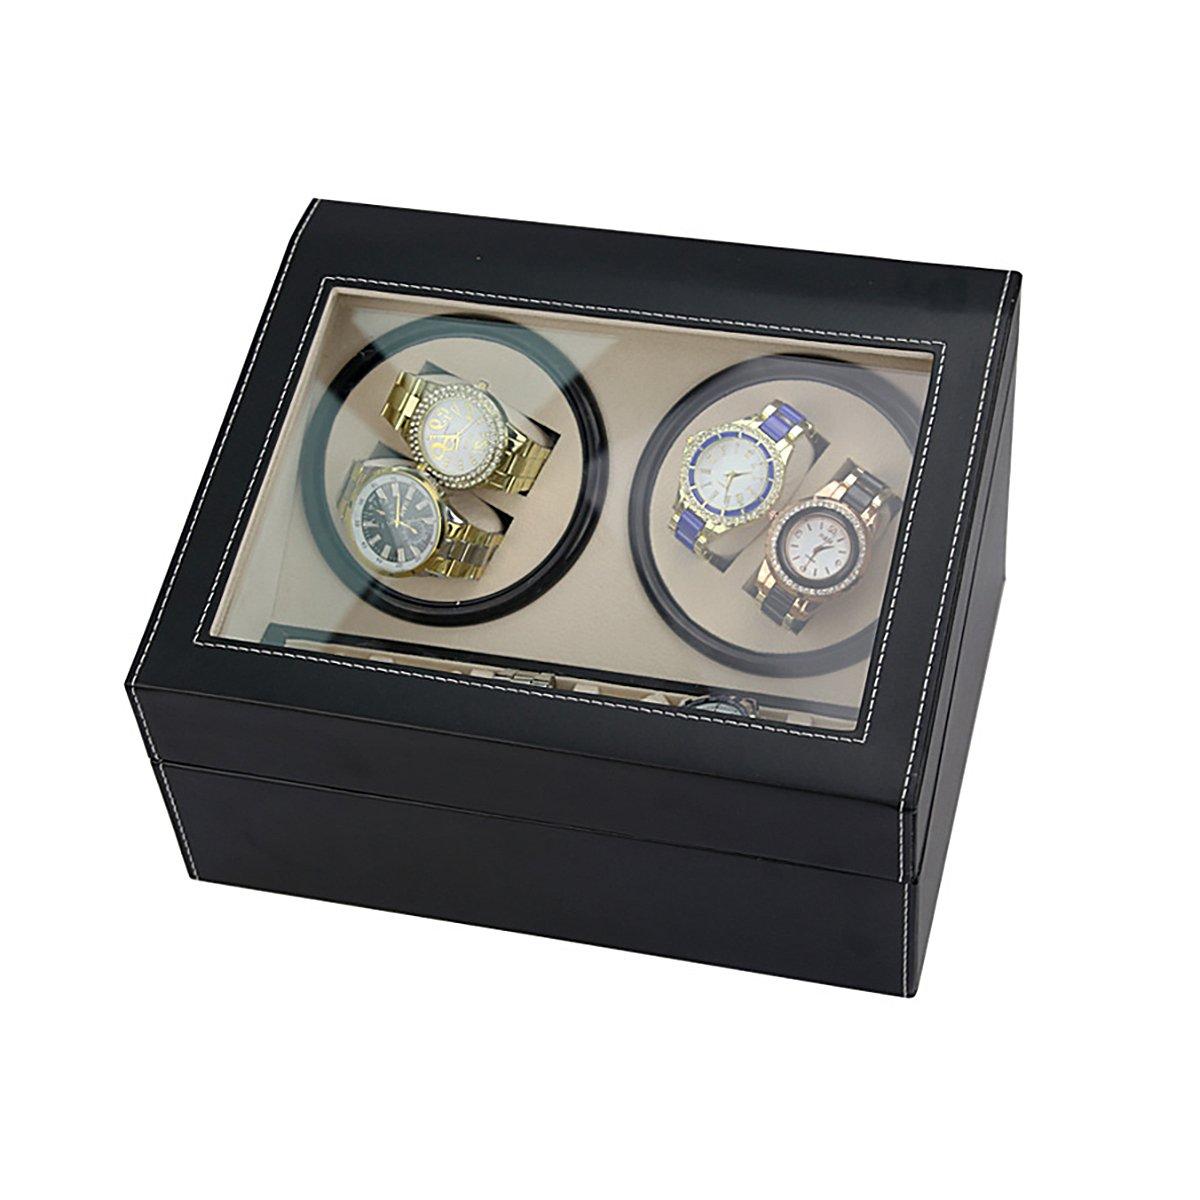 HooAMI Leather Automatic Rotation 4+6 Watch Winder Storage Case Display Box by HooAMI (Image #2)